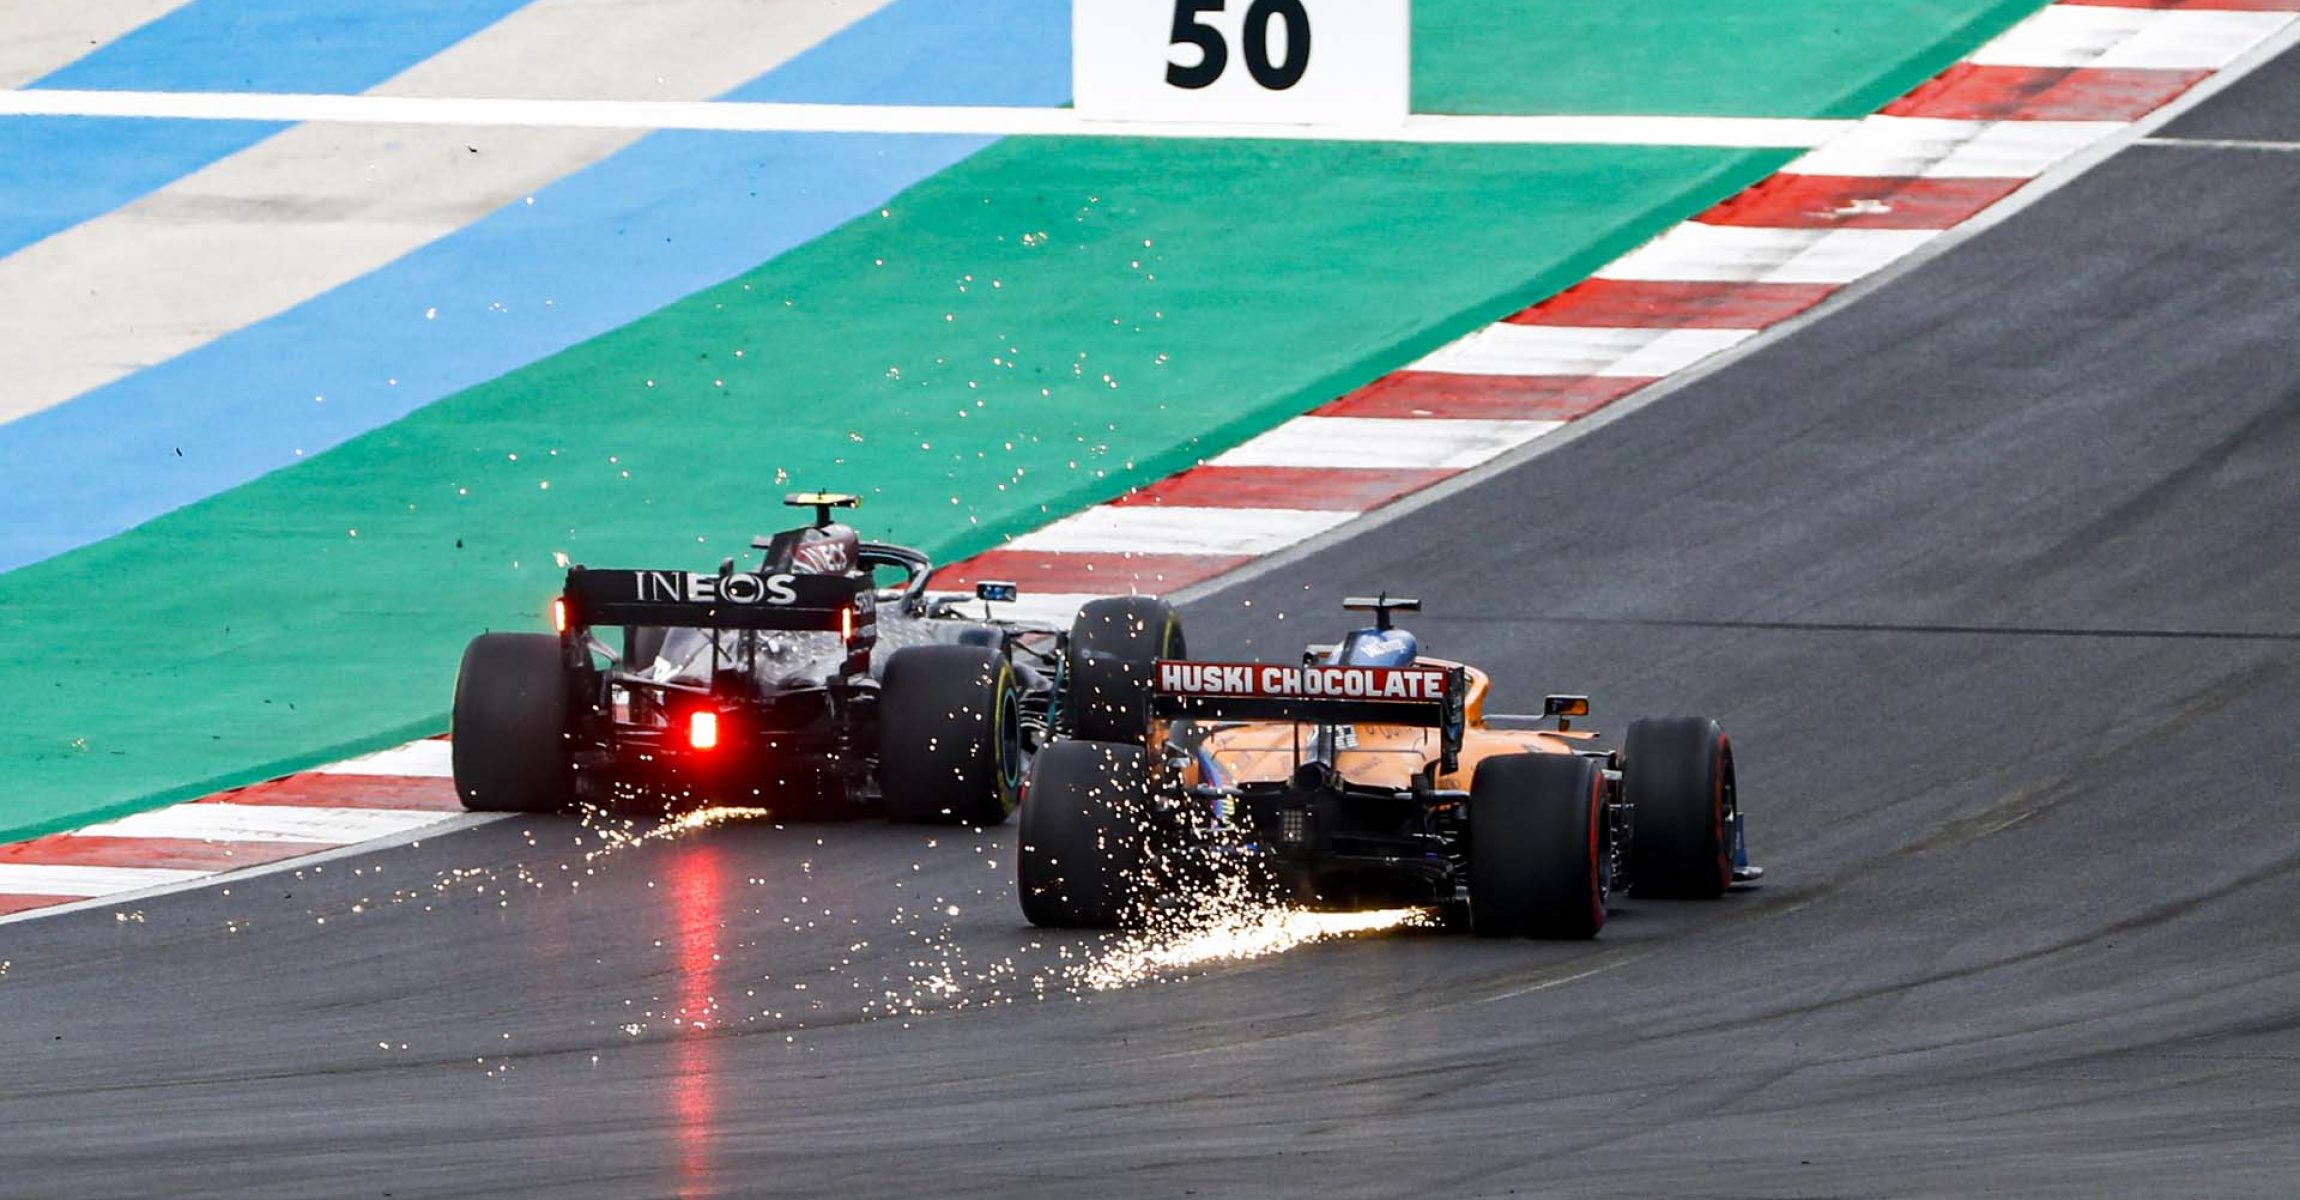 Valtteri Bottas, Mercedes F1 W11 EQ Performance, leads Carlos Sainz, McLaren MCL35